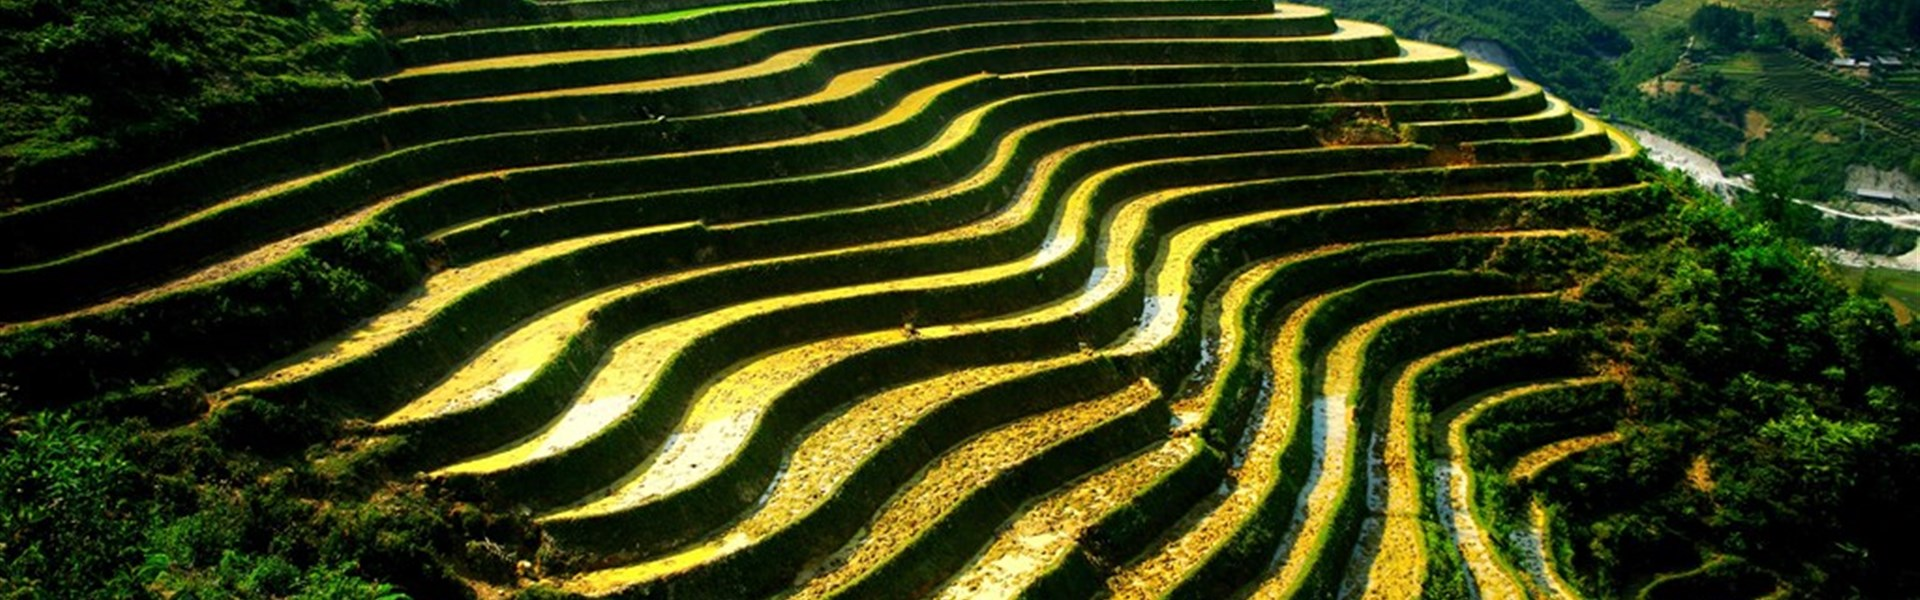 Okruh - Objevte severní Vietnam a Sapu s českým průvodcem - Sapa - krajina